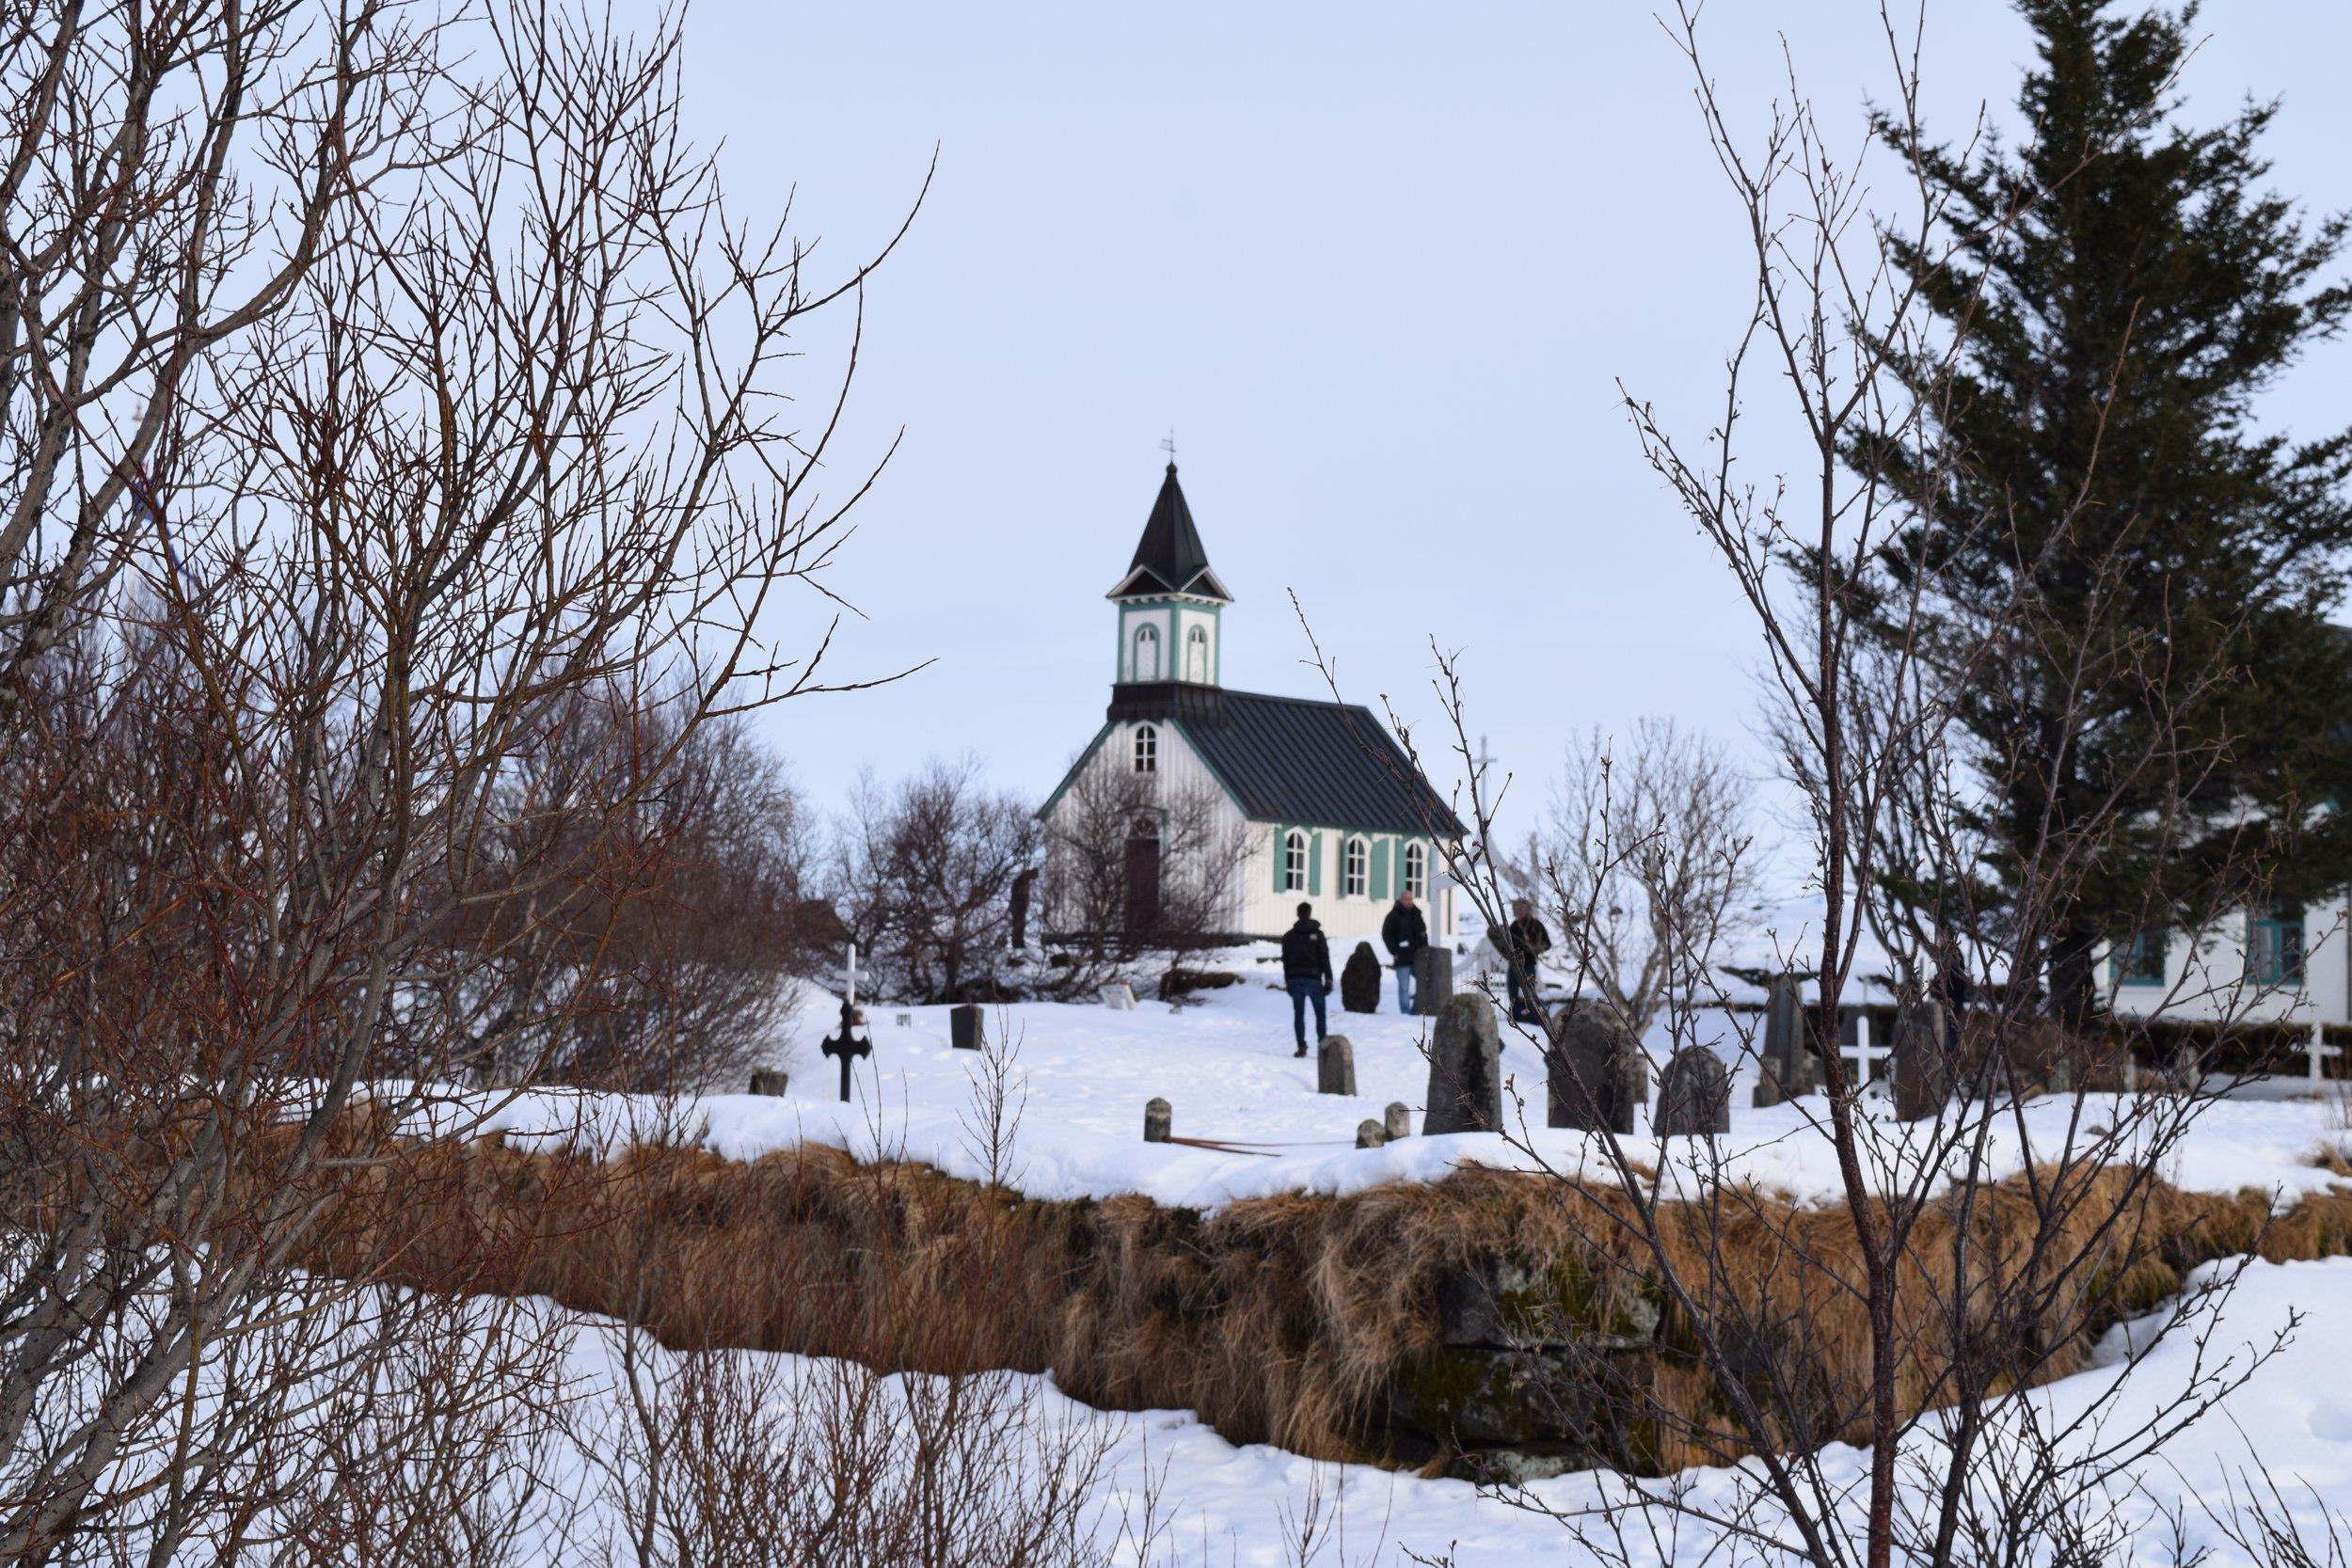 Þingvallakirkja Church @Þingvellir National Park